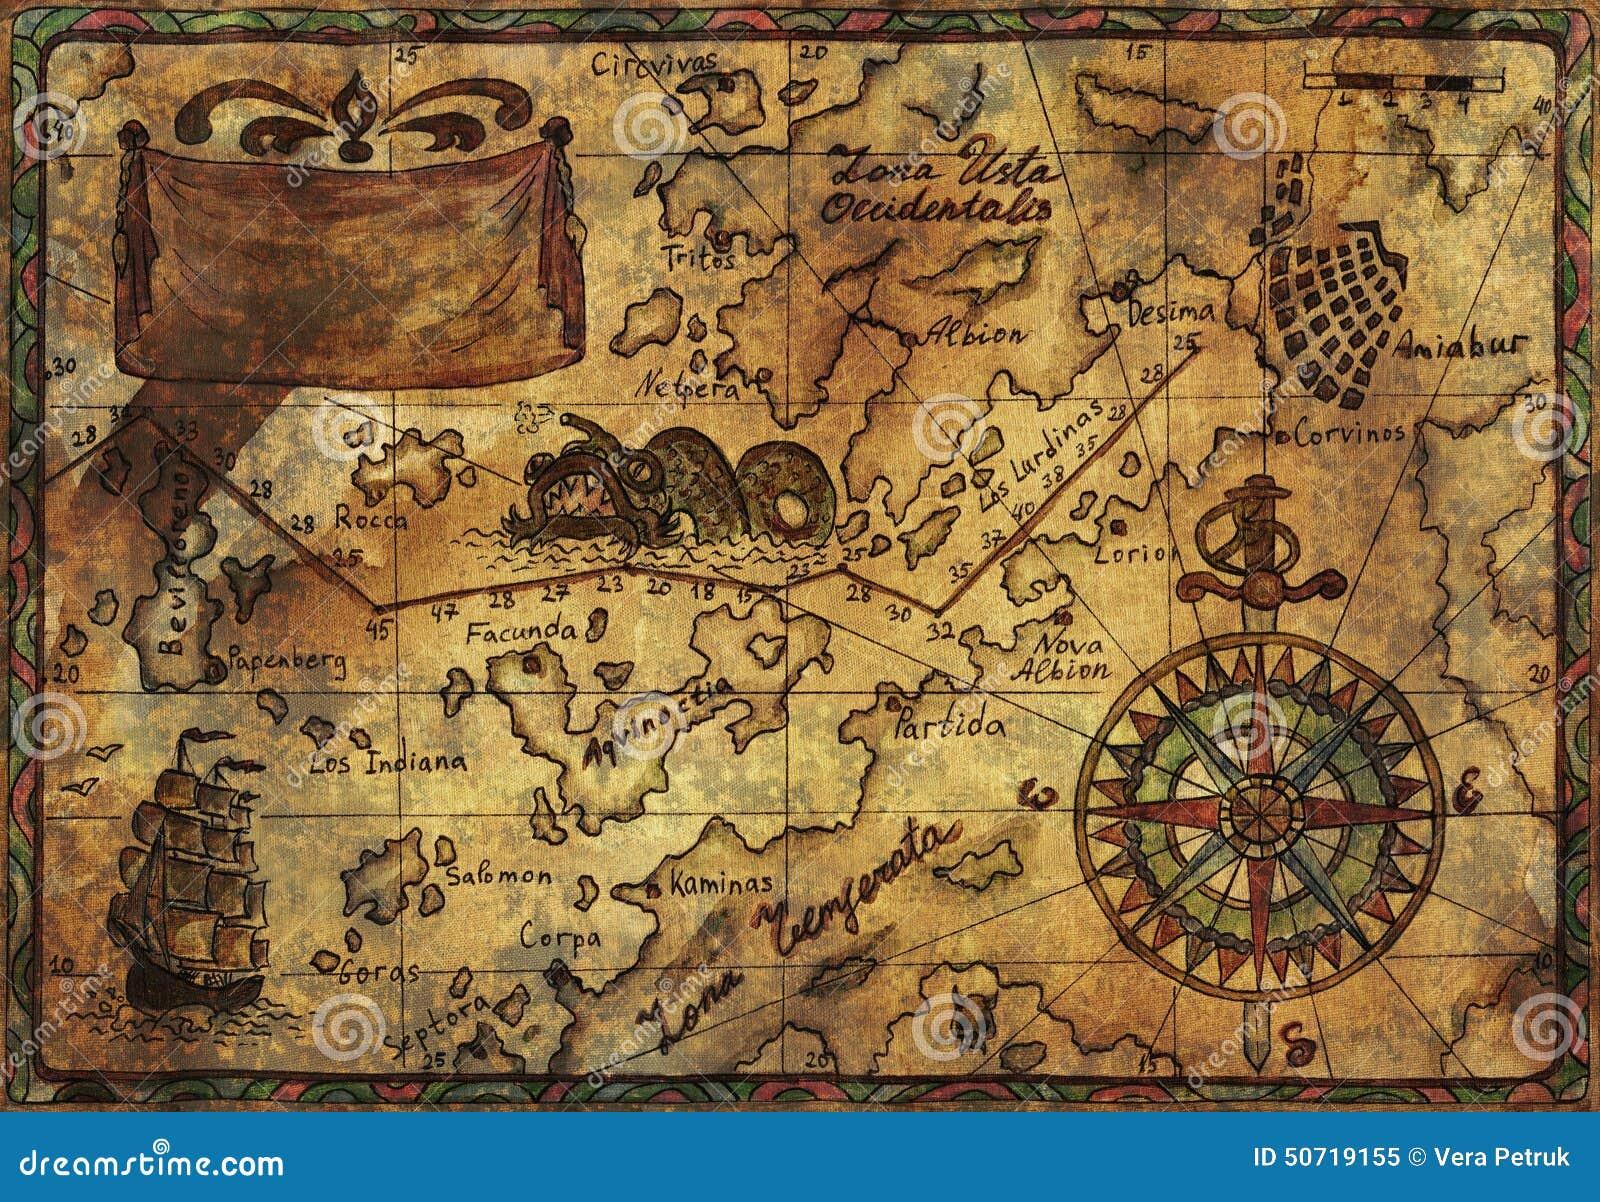 Pirate Sayings Treasure Island